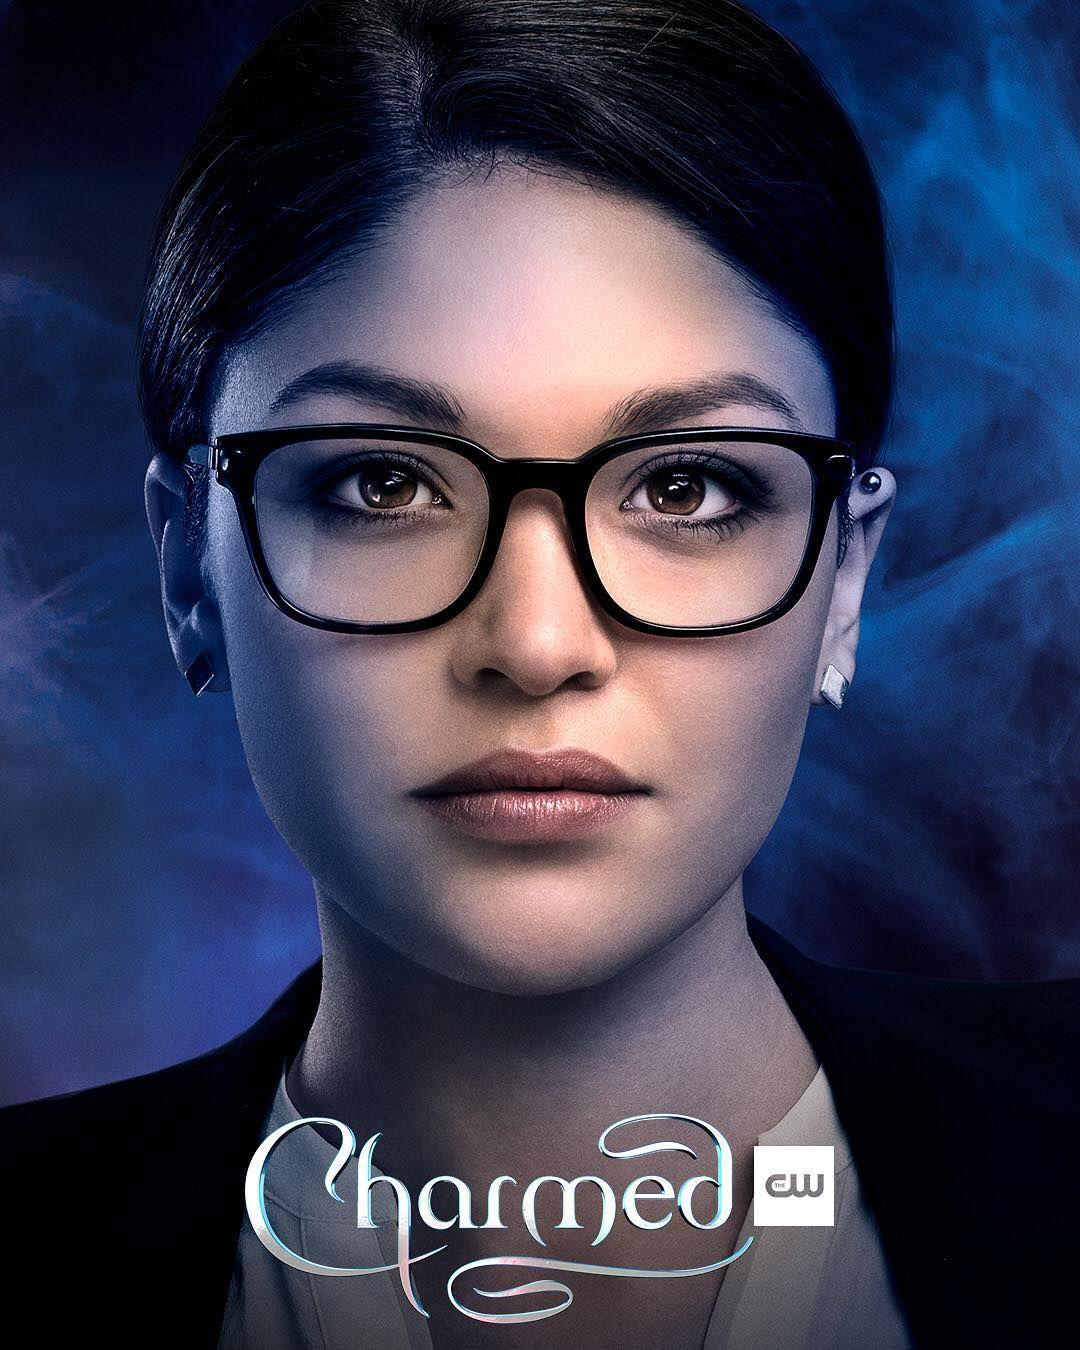 Charmed S1 Poster Ellen Tamaki as